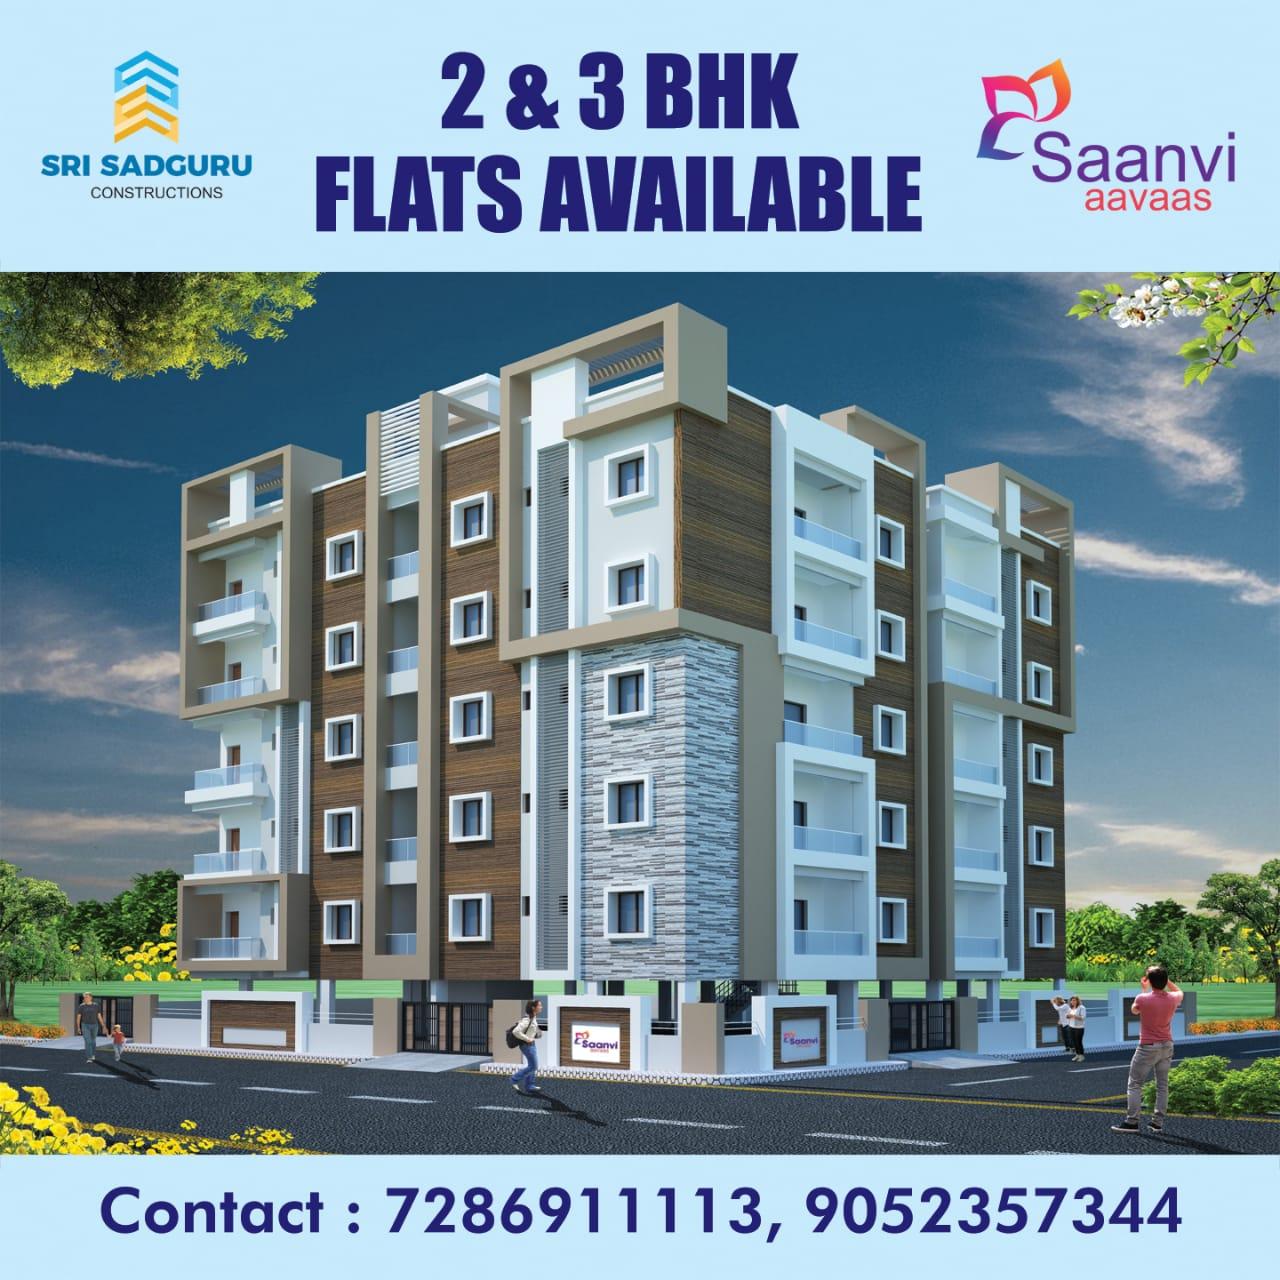 Flat For Sale in Miyapur Saanvi Aavas Apartment